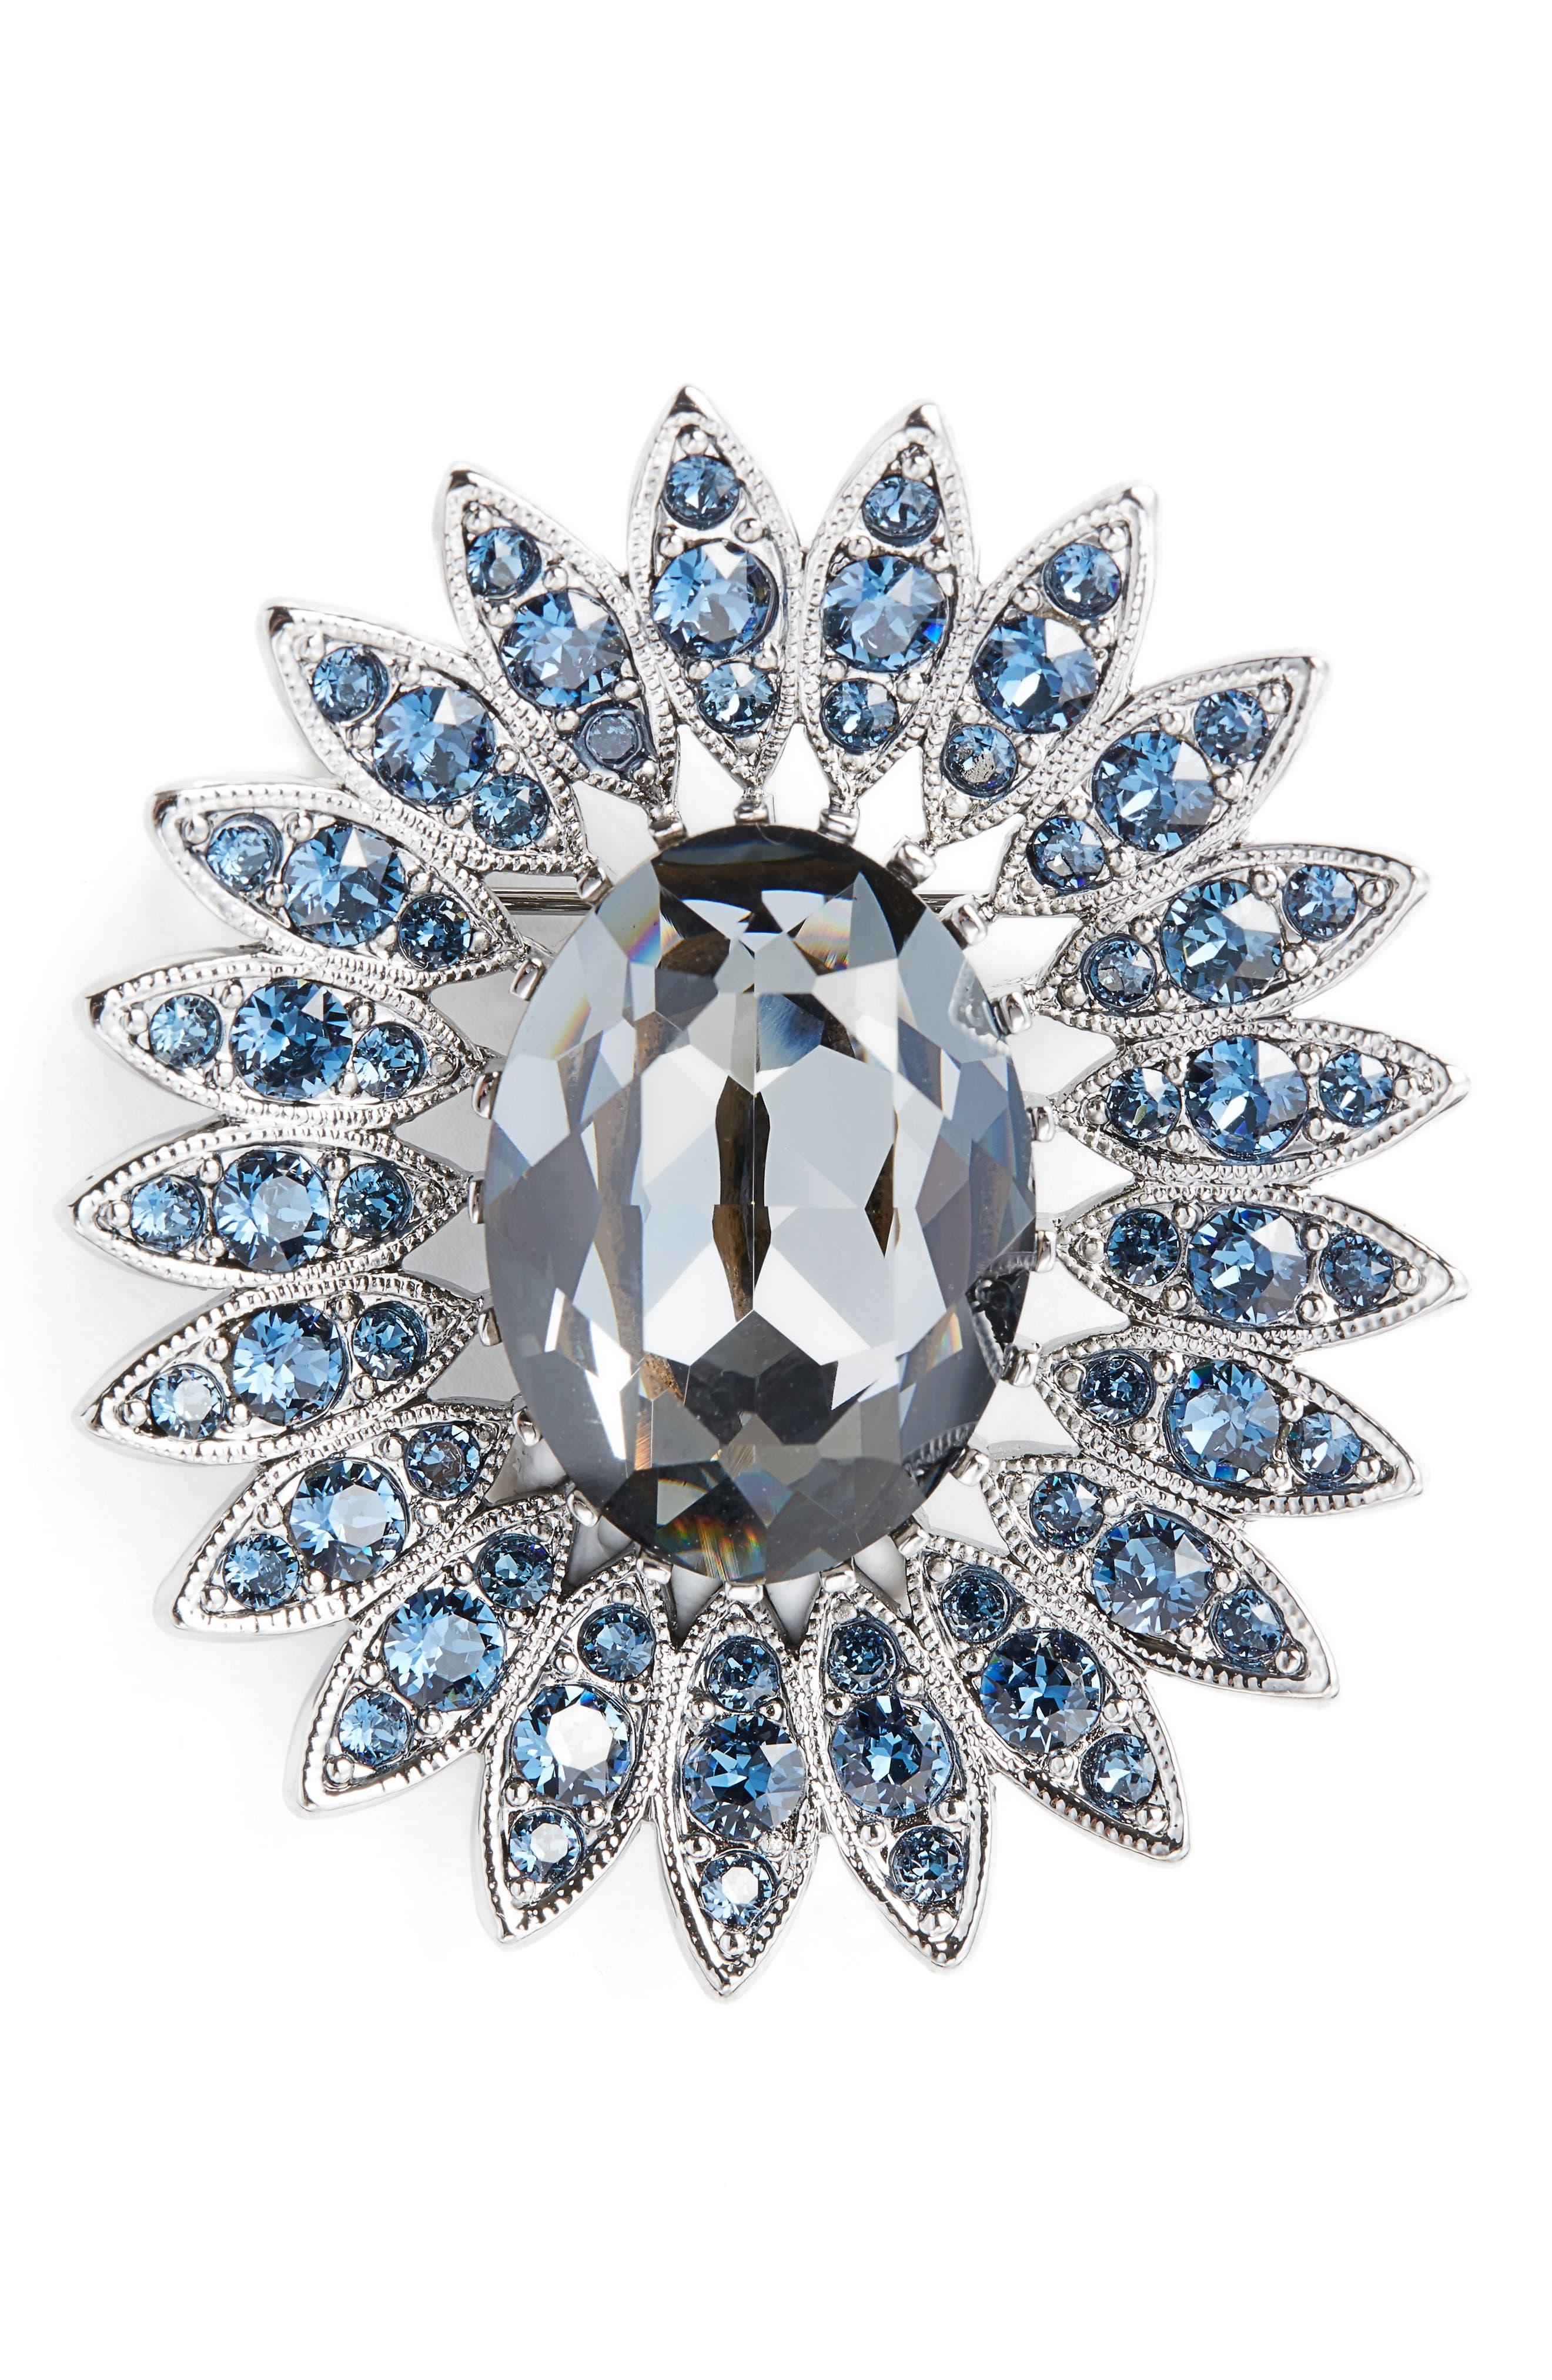 Main Image - St. John Collection Swarovski Crystal Pin